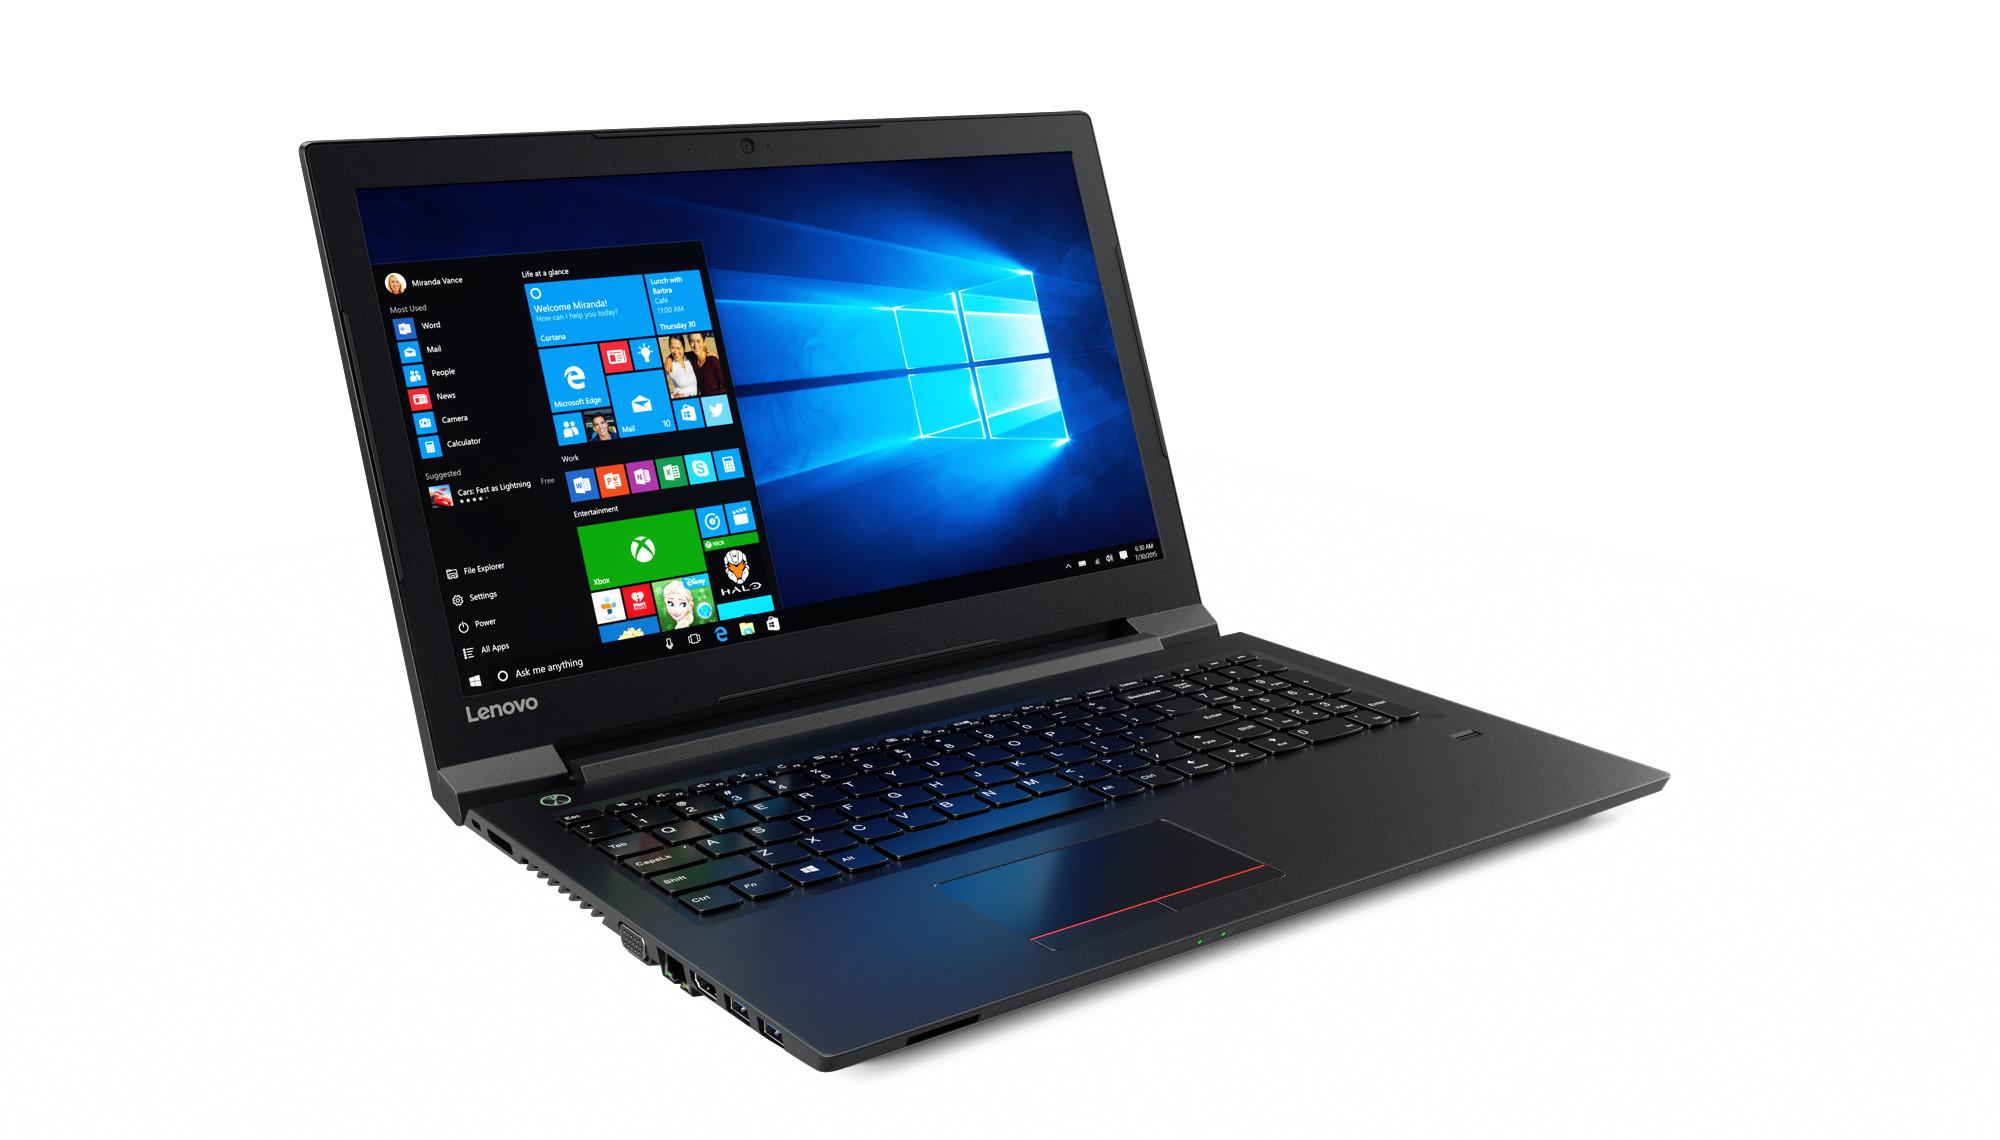 Lenovo V310-15ISK/i3-6100U/1TB/8GB/AMD/DVD/F/W10H